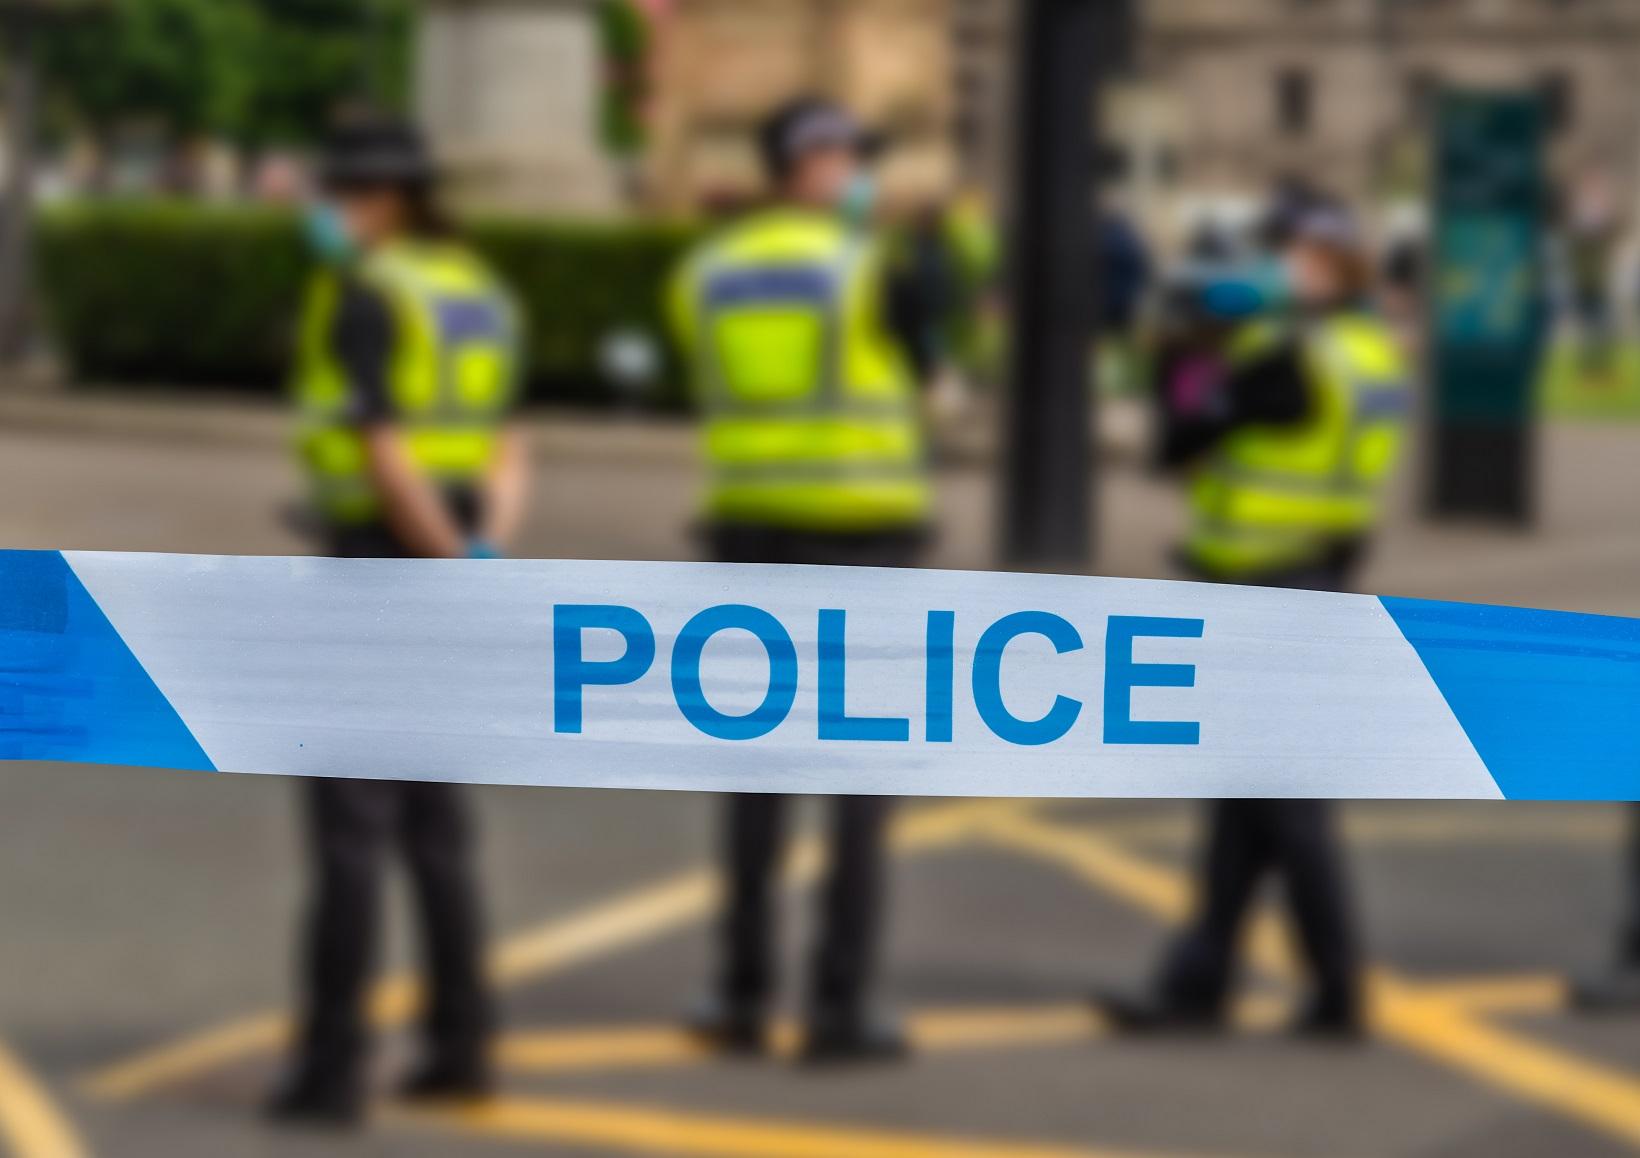 glasgow police at an incident ZACALBU #новости Авиньон, исламизм, теракт, терроризм, Франция